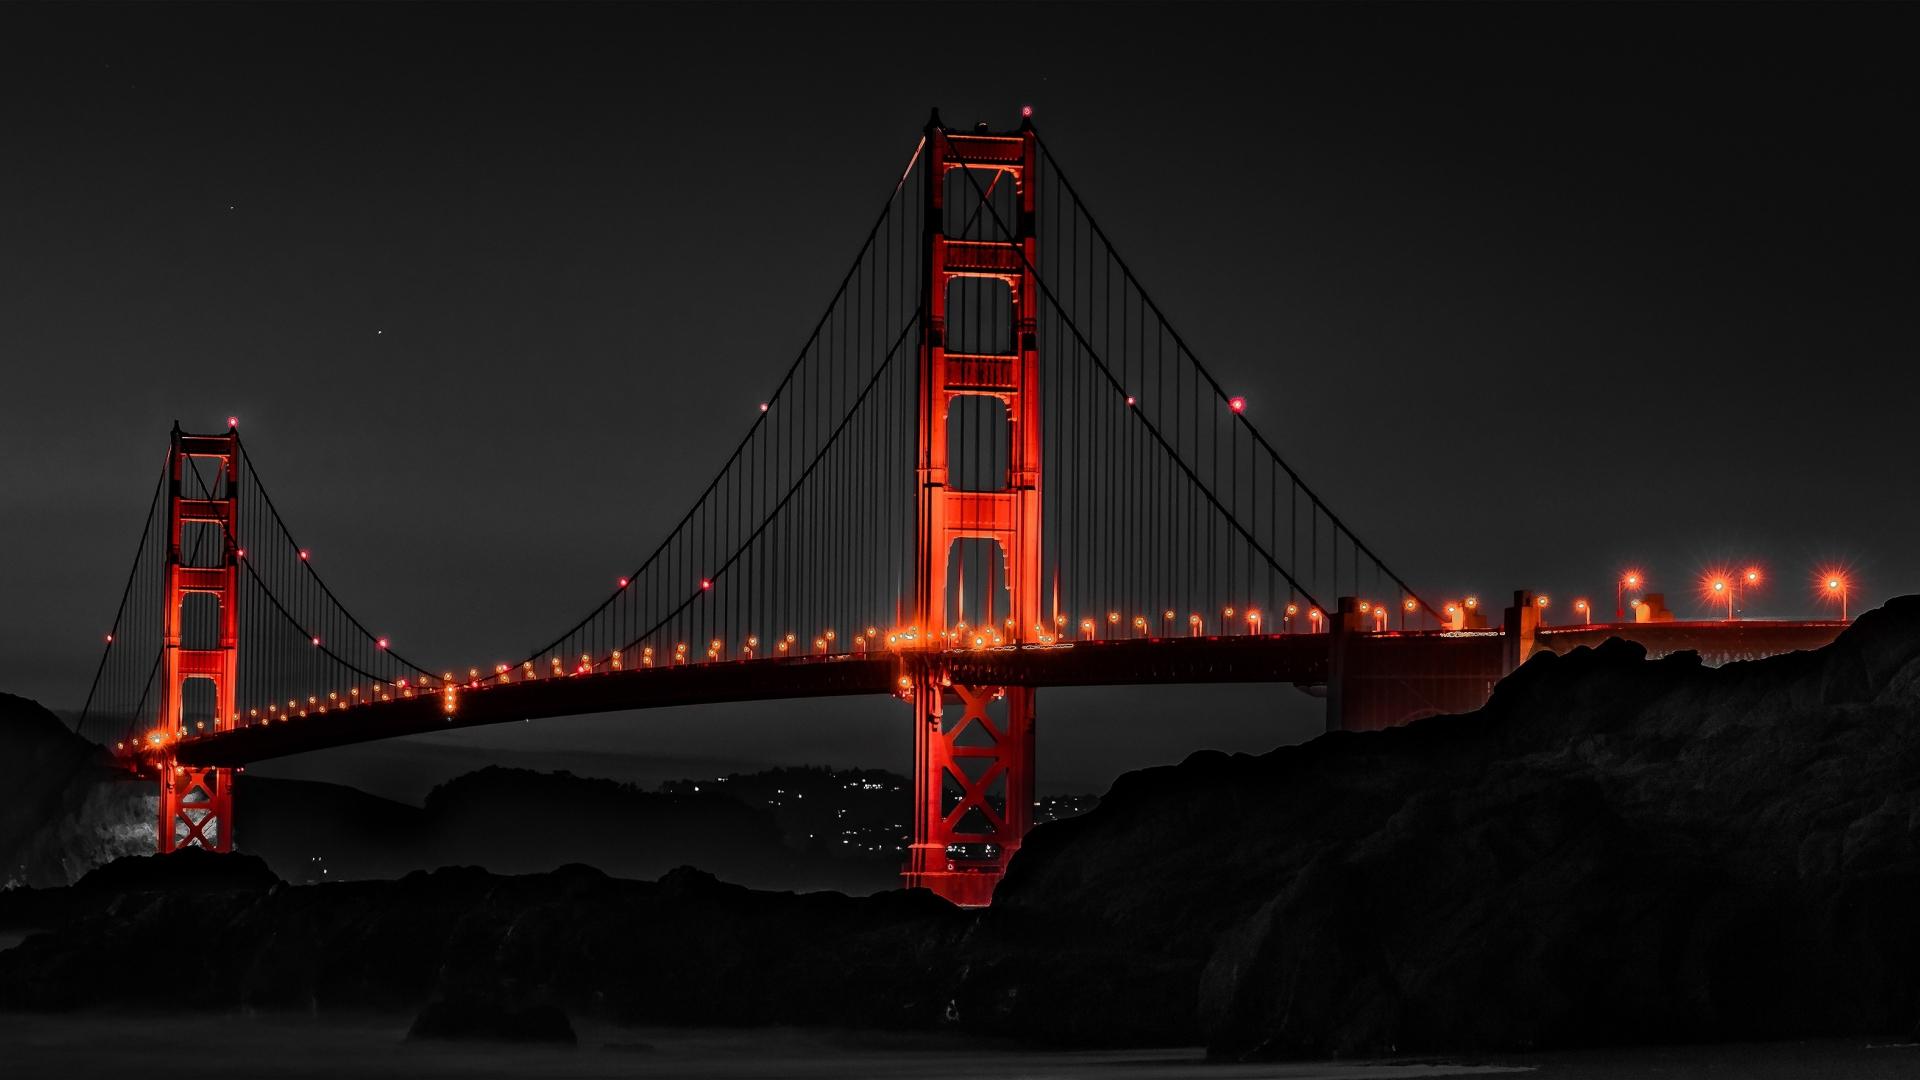 Download 1920x1080 Wallpaper Golden Gate Bridge San Francisco